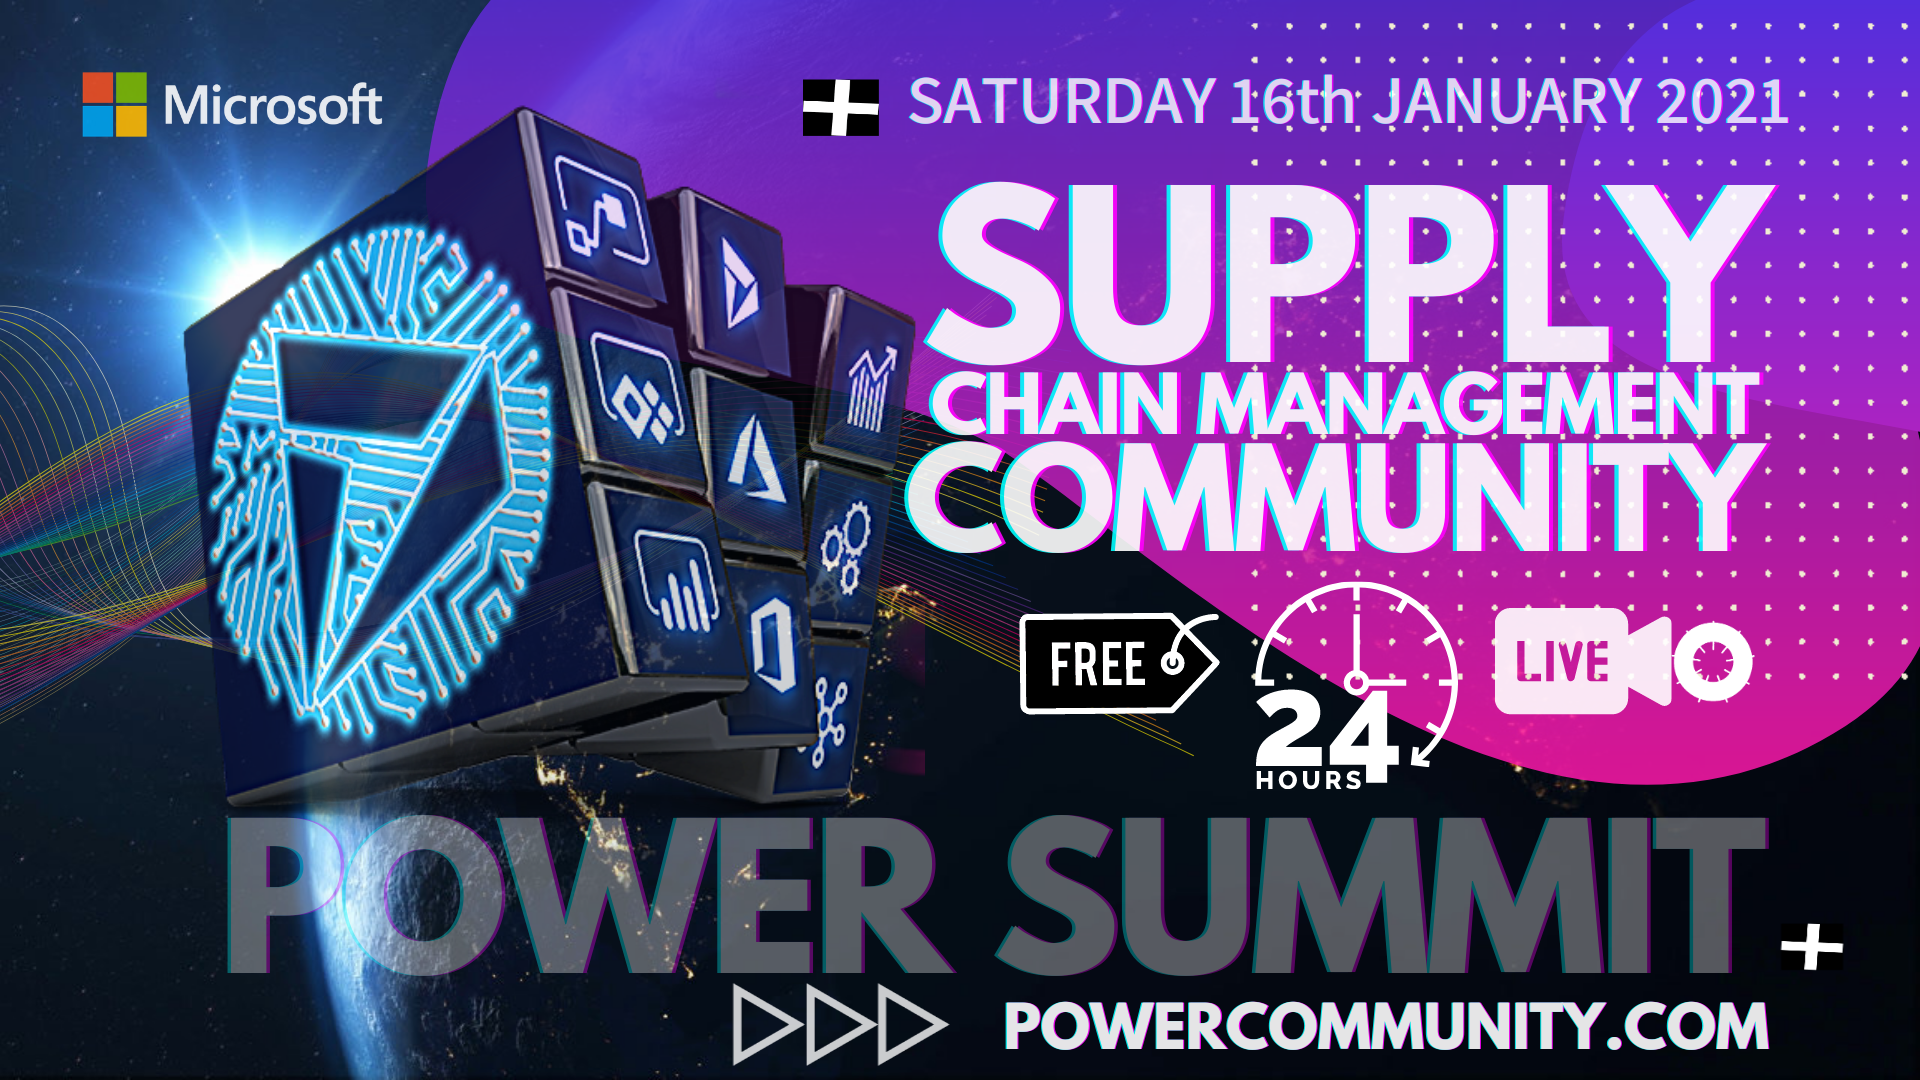 D365 FinOps Supply Chain Management Community Summit